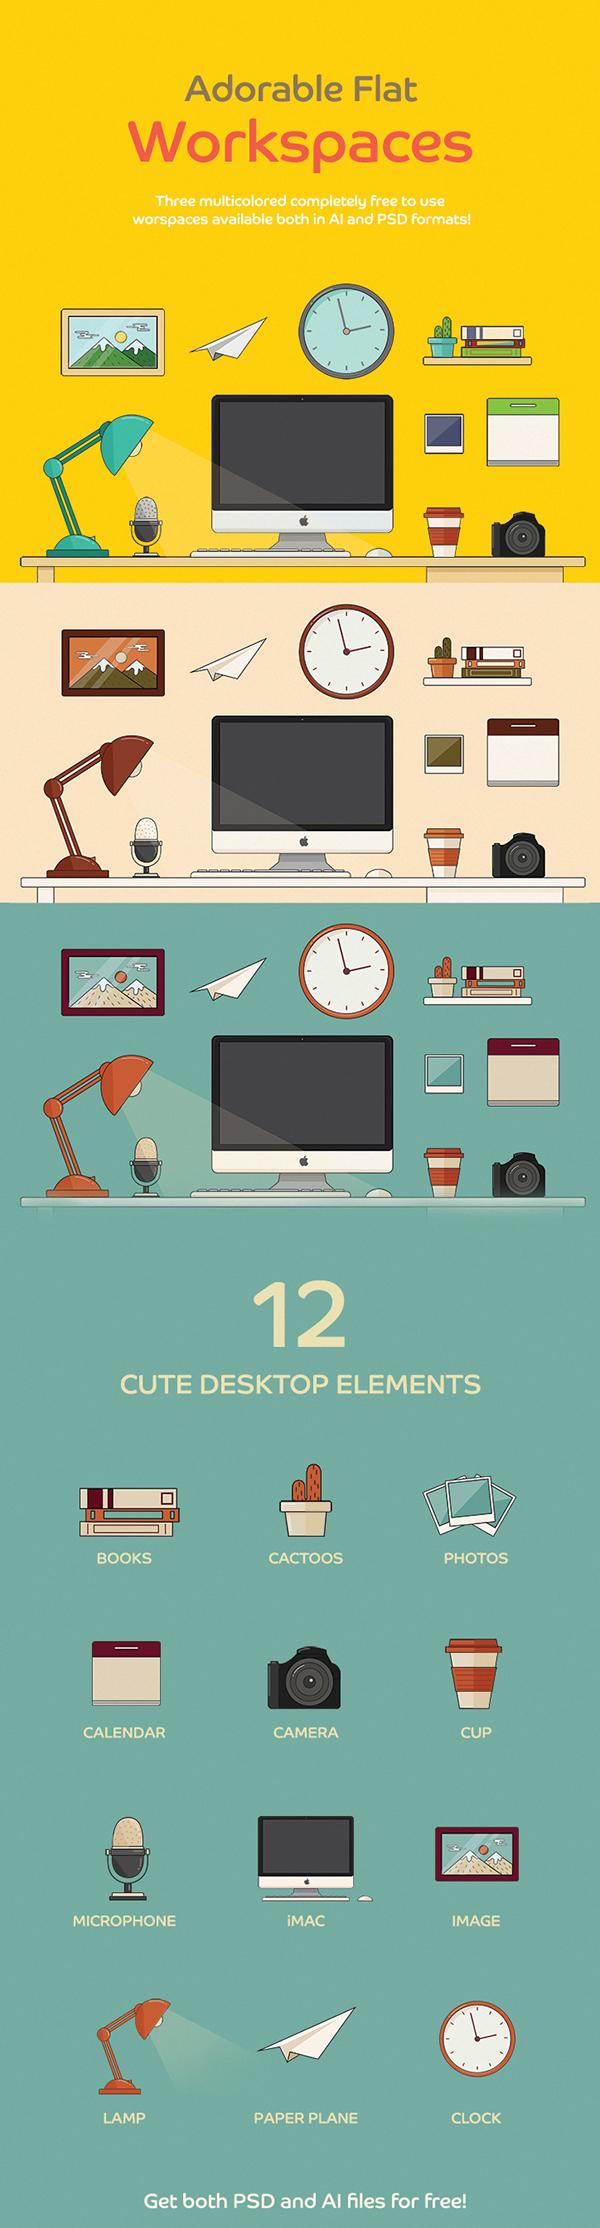 workspace desk flat freebie iMac vector psd free ai illustrate minimal download free Pack kit